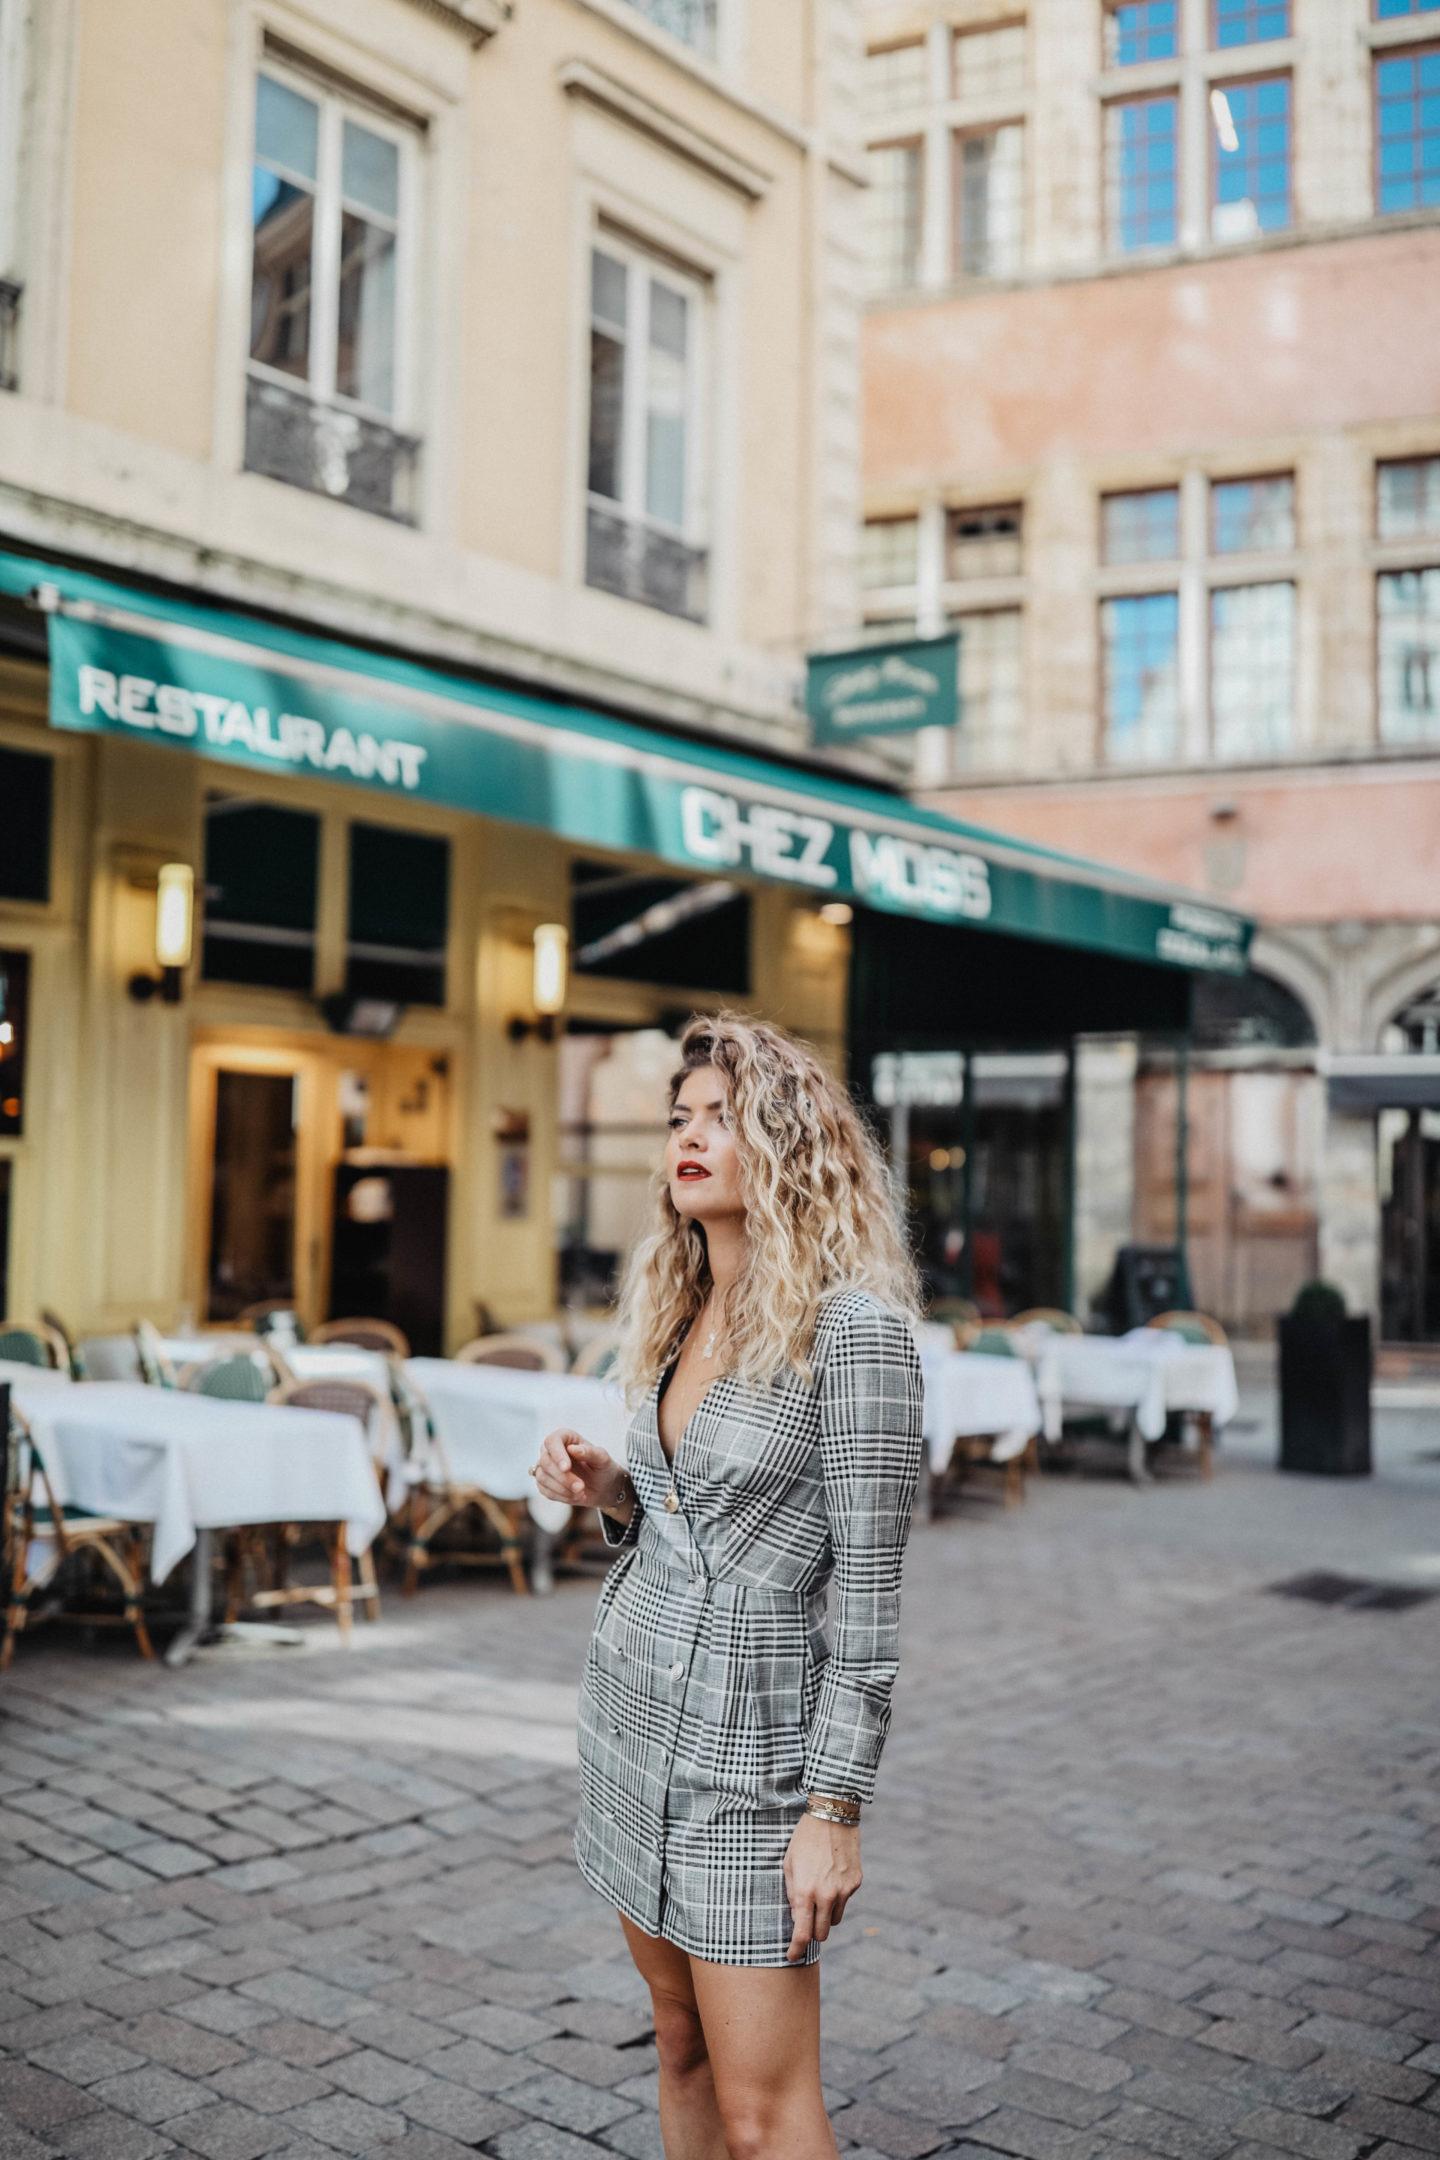 Robe blazer à carreaux Zara marie and mood blog mode